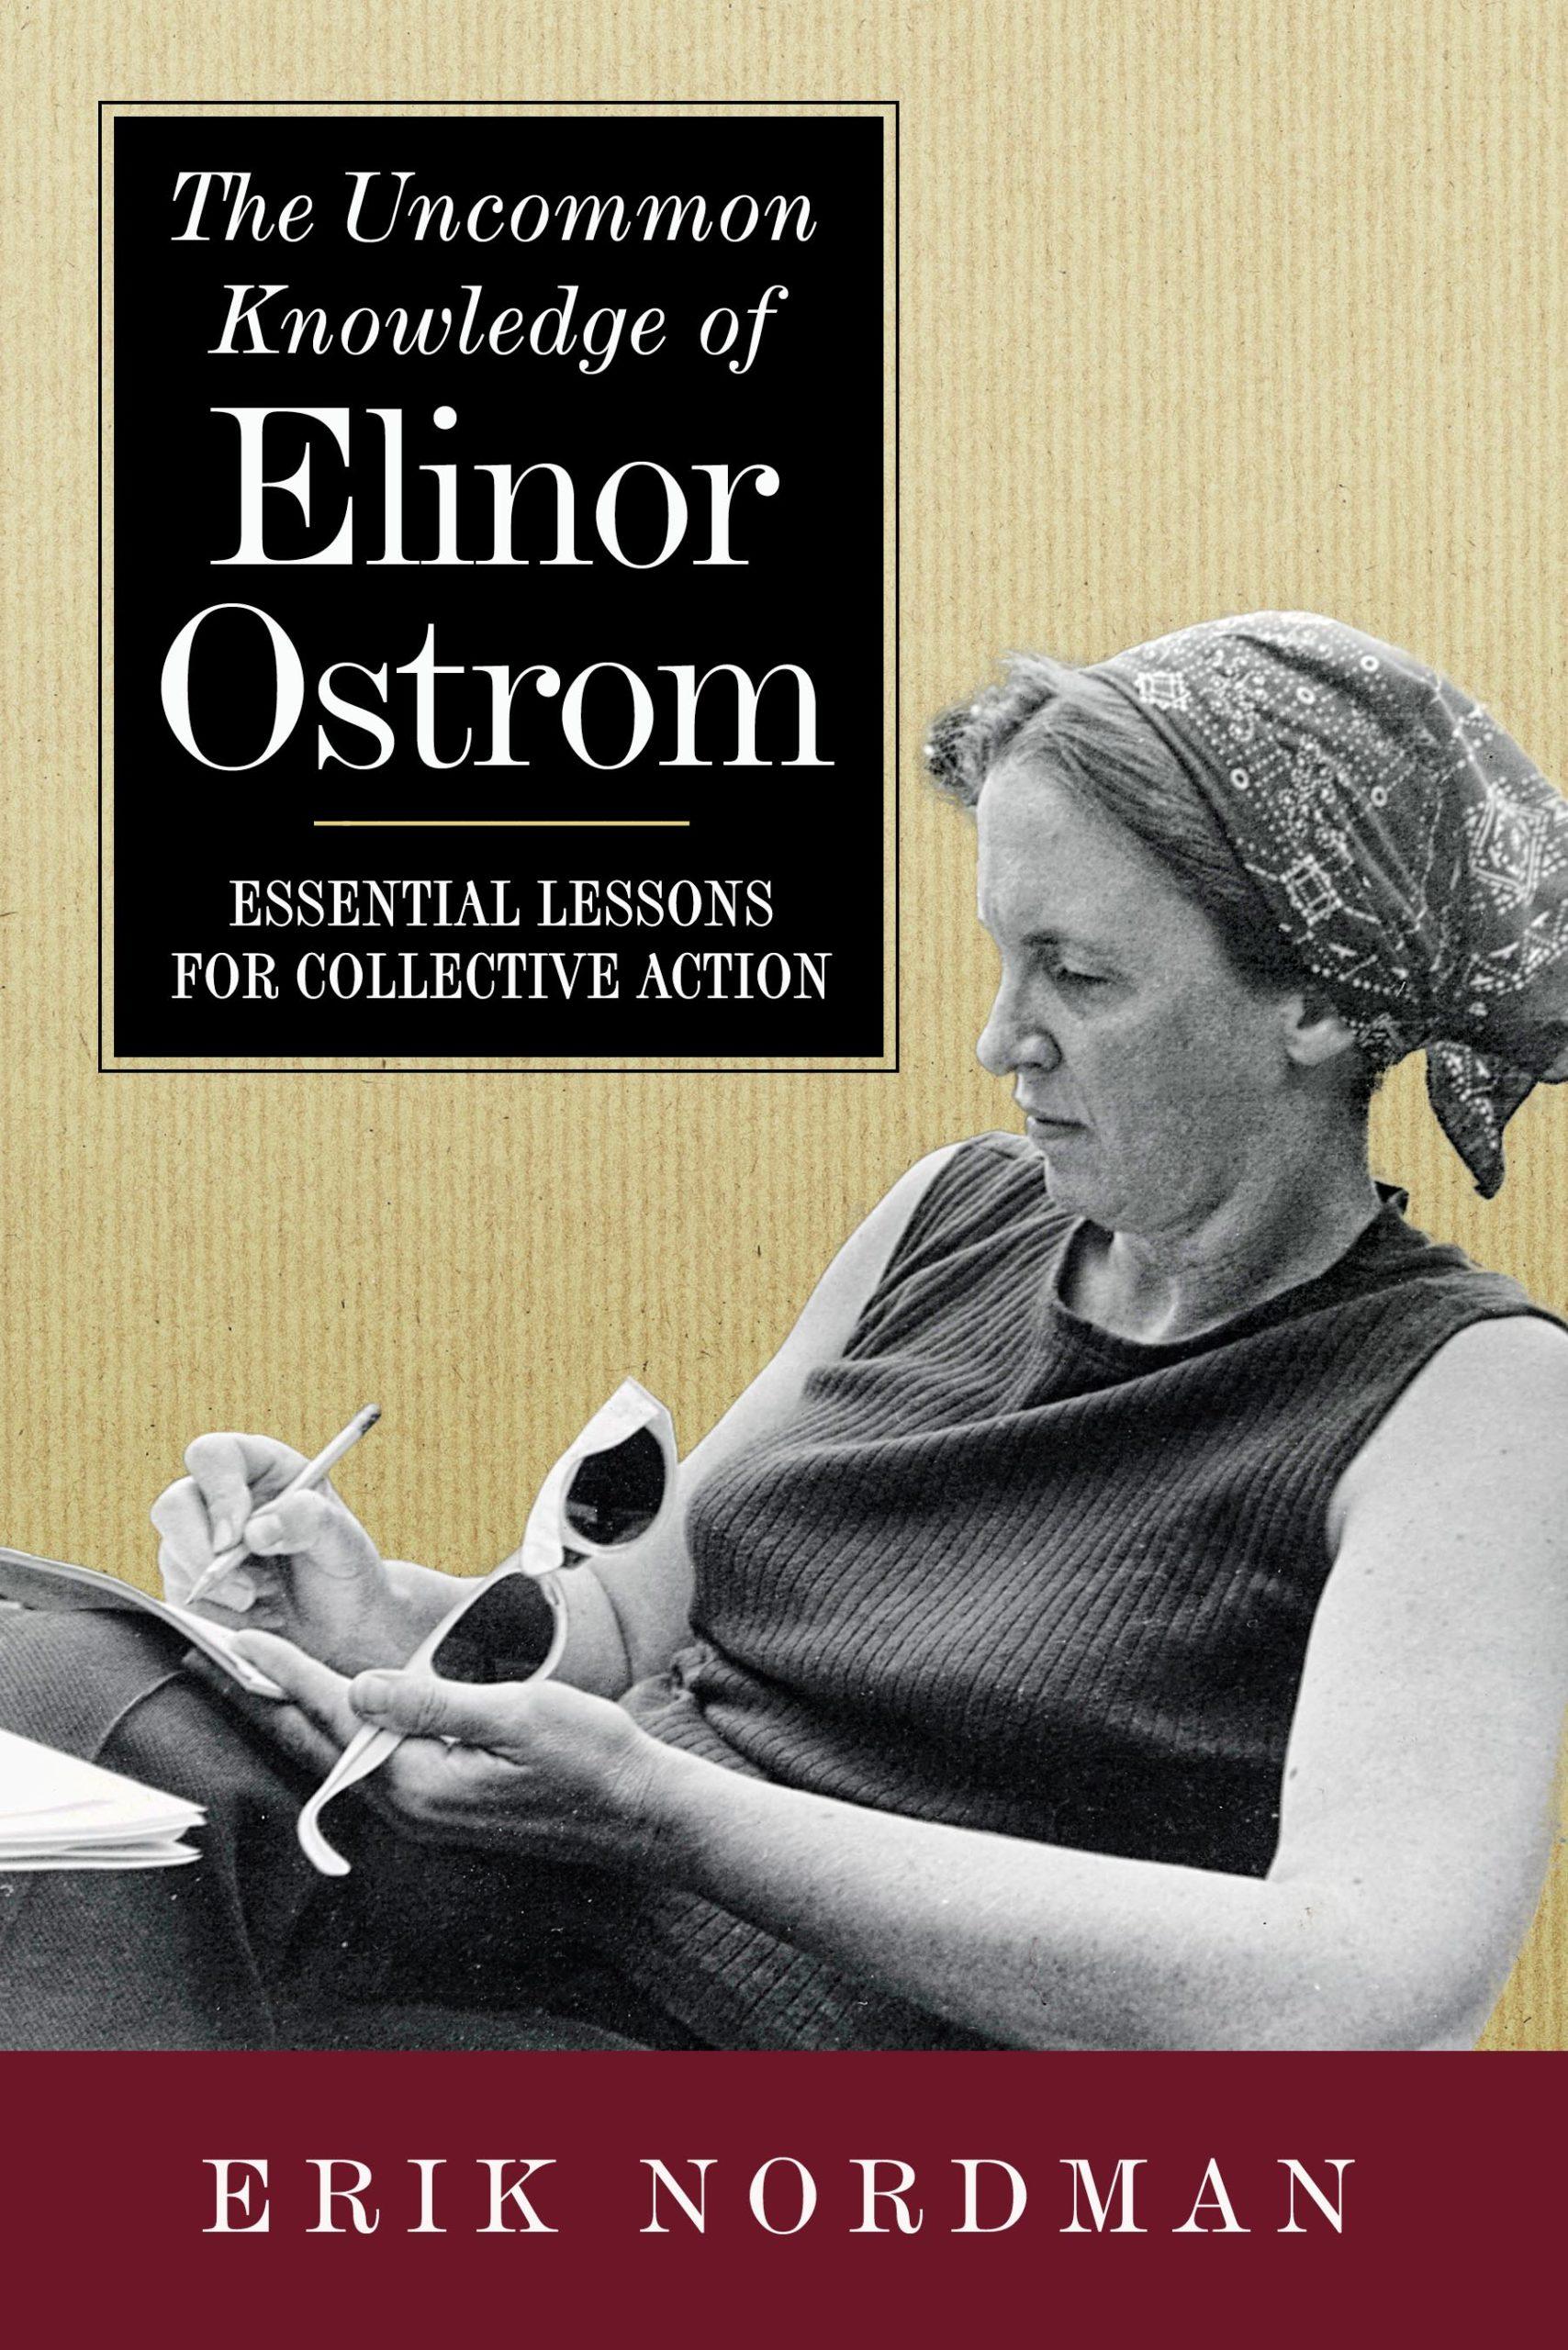 9781642831559_Nordman_The Uncommon Knowledge of Elinor Ostrom